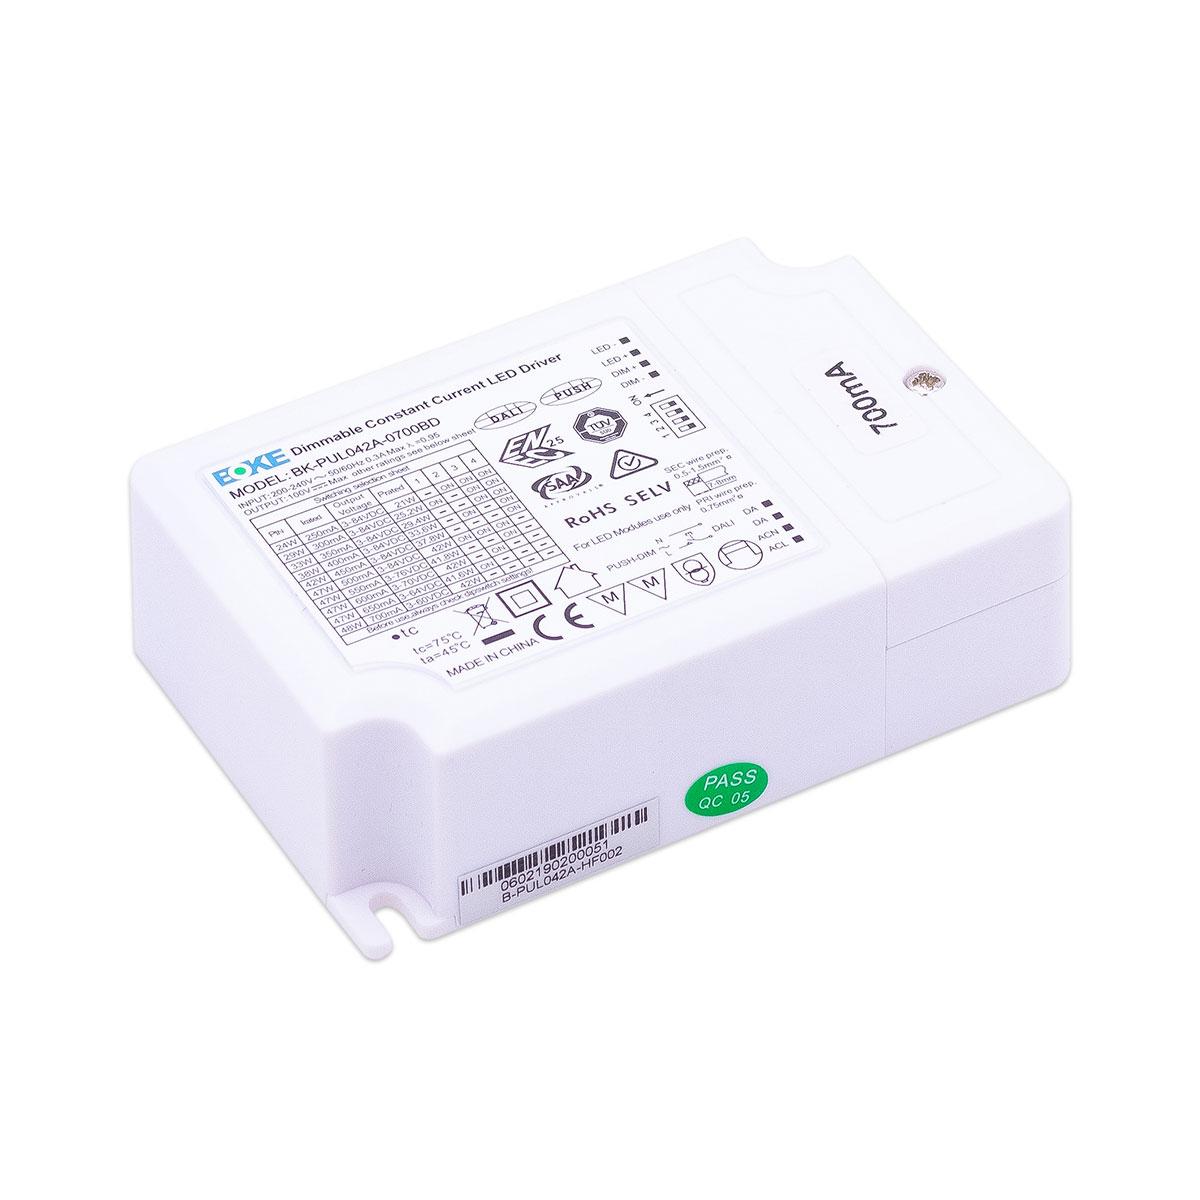 LED Treiber 42W 3-84V 0.6-1.1A IP20 dimmbar DALI / 1-10V / PUSH, BOKE BK-PUL042A-0700BD Konstantstrom CC